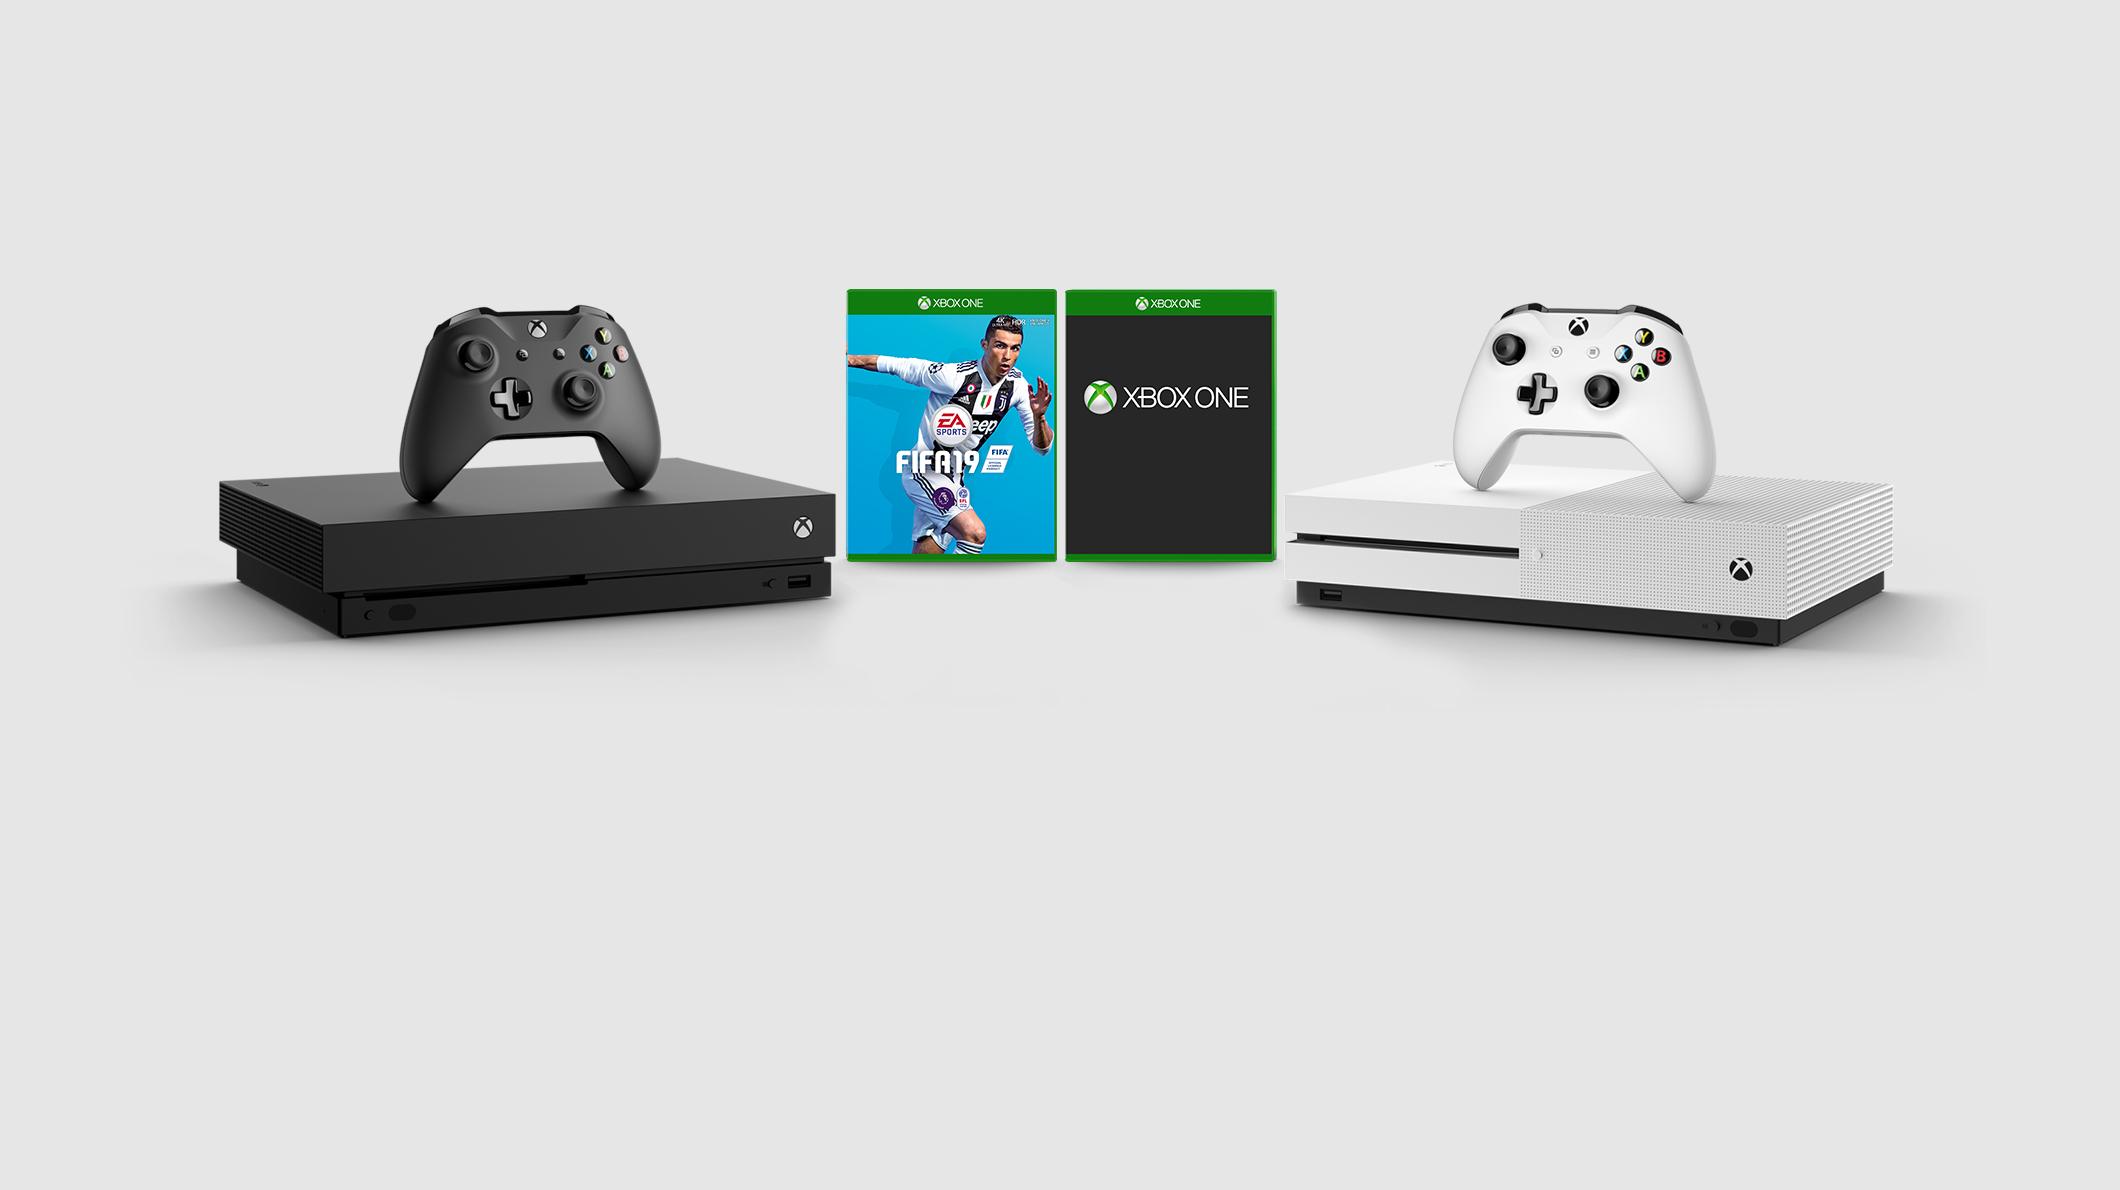 Xbox One S console, Xbox One X console. FIFA 19 game